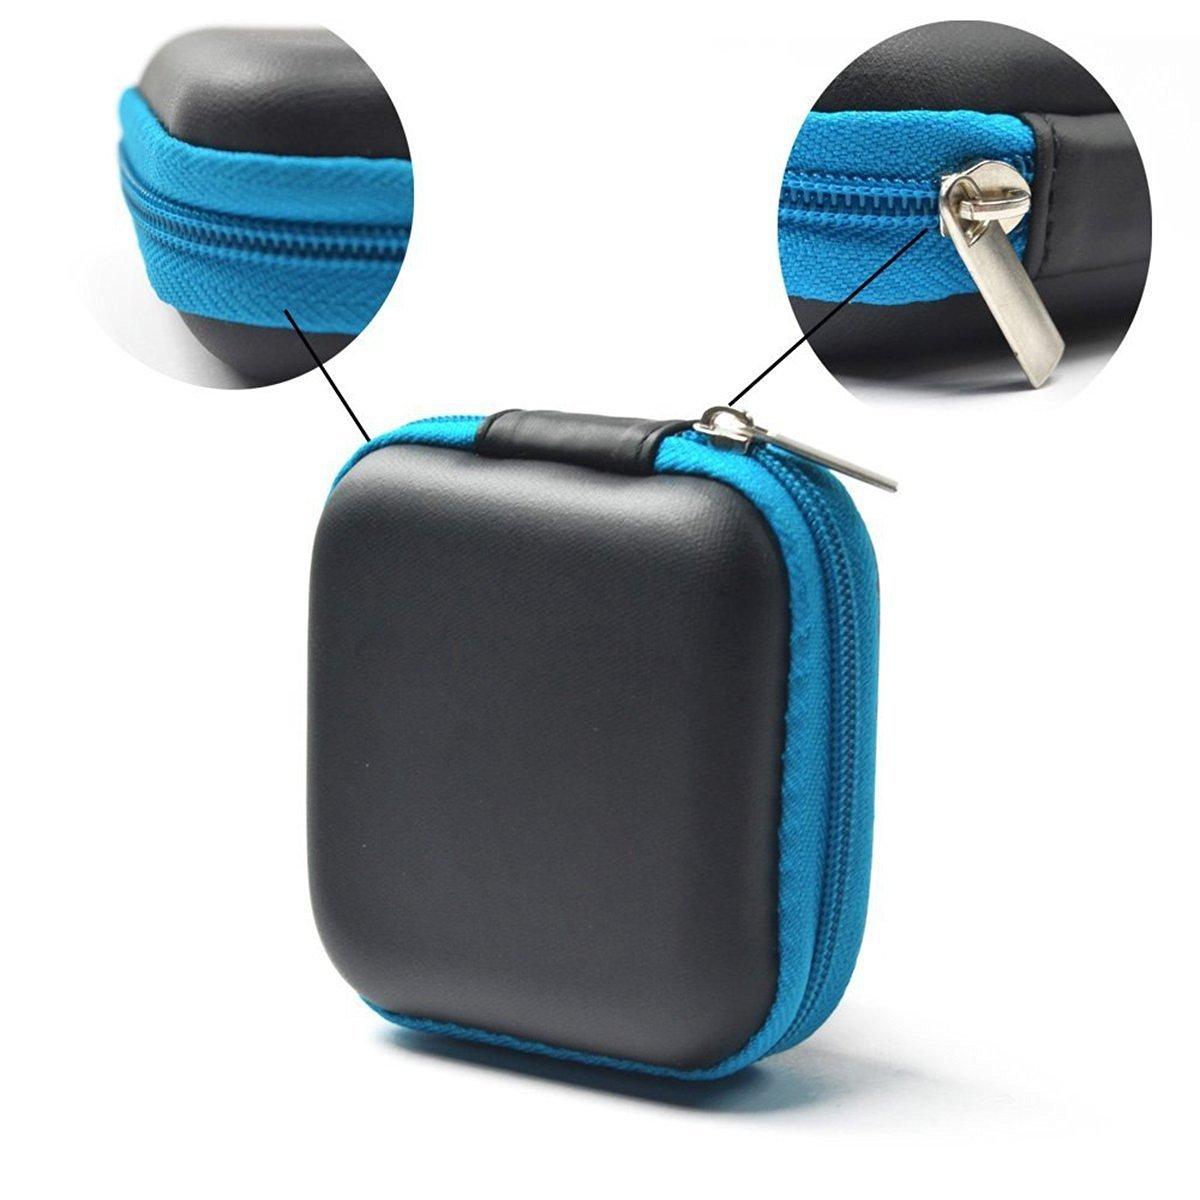 xel_uu.11 Square Portable Storage Bag Earphone Storage Box Anti-Pressure Coin Purse Earplugs Box